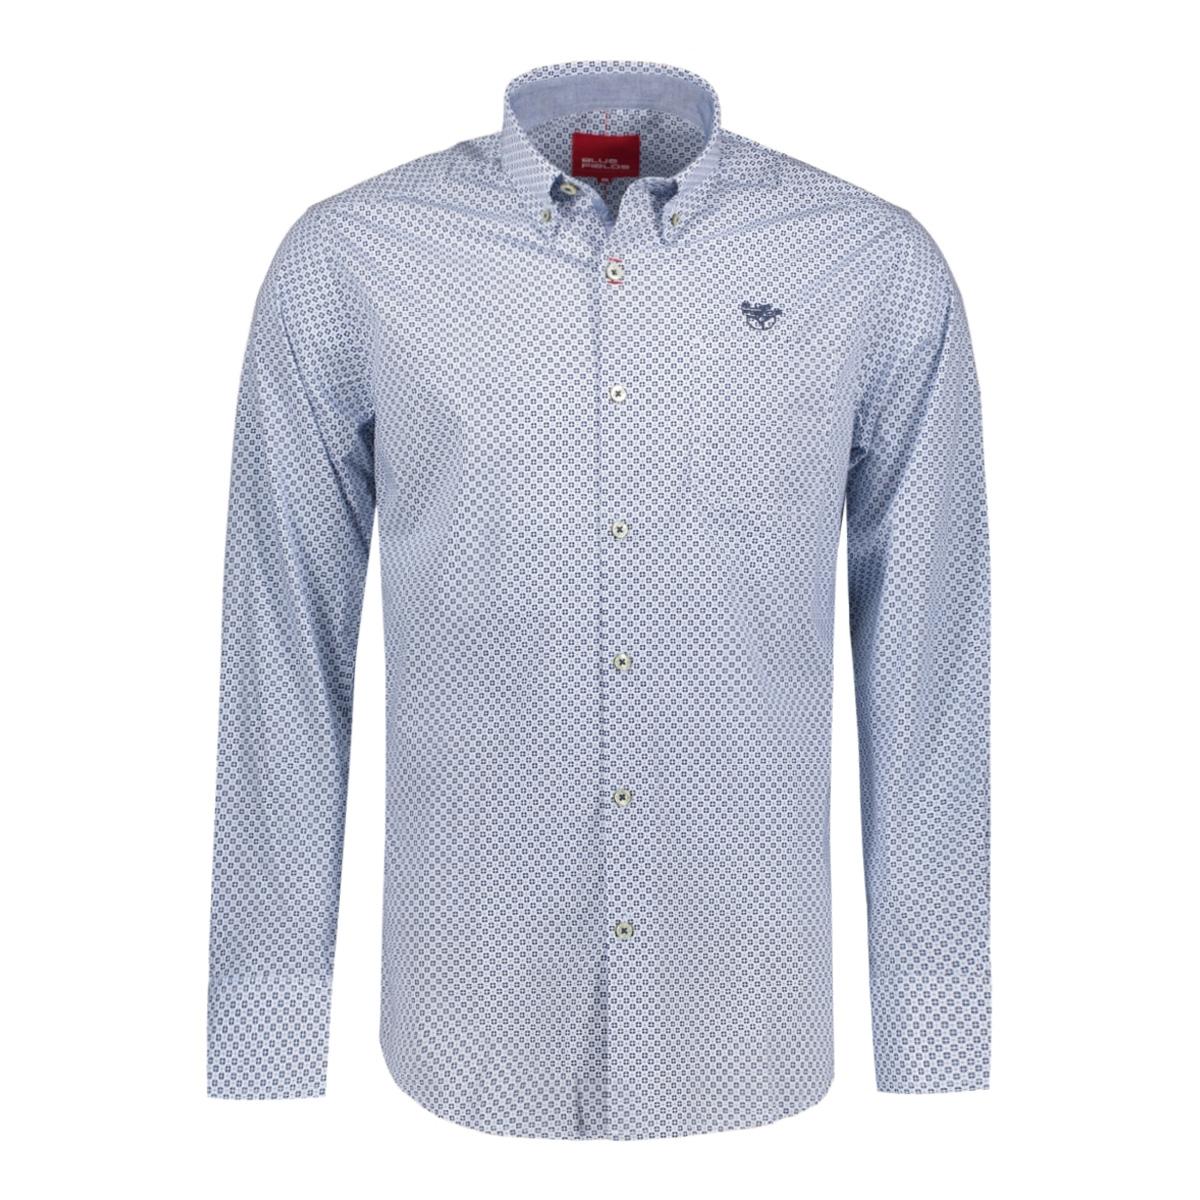 214-37053 bluefields overhemd 5357